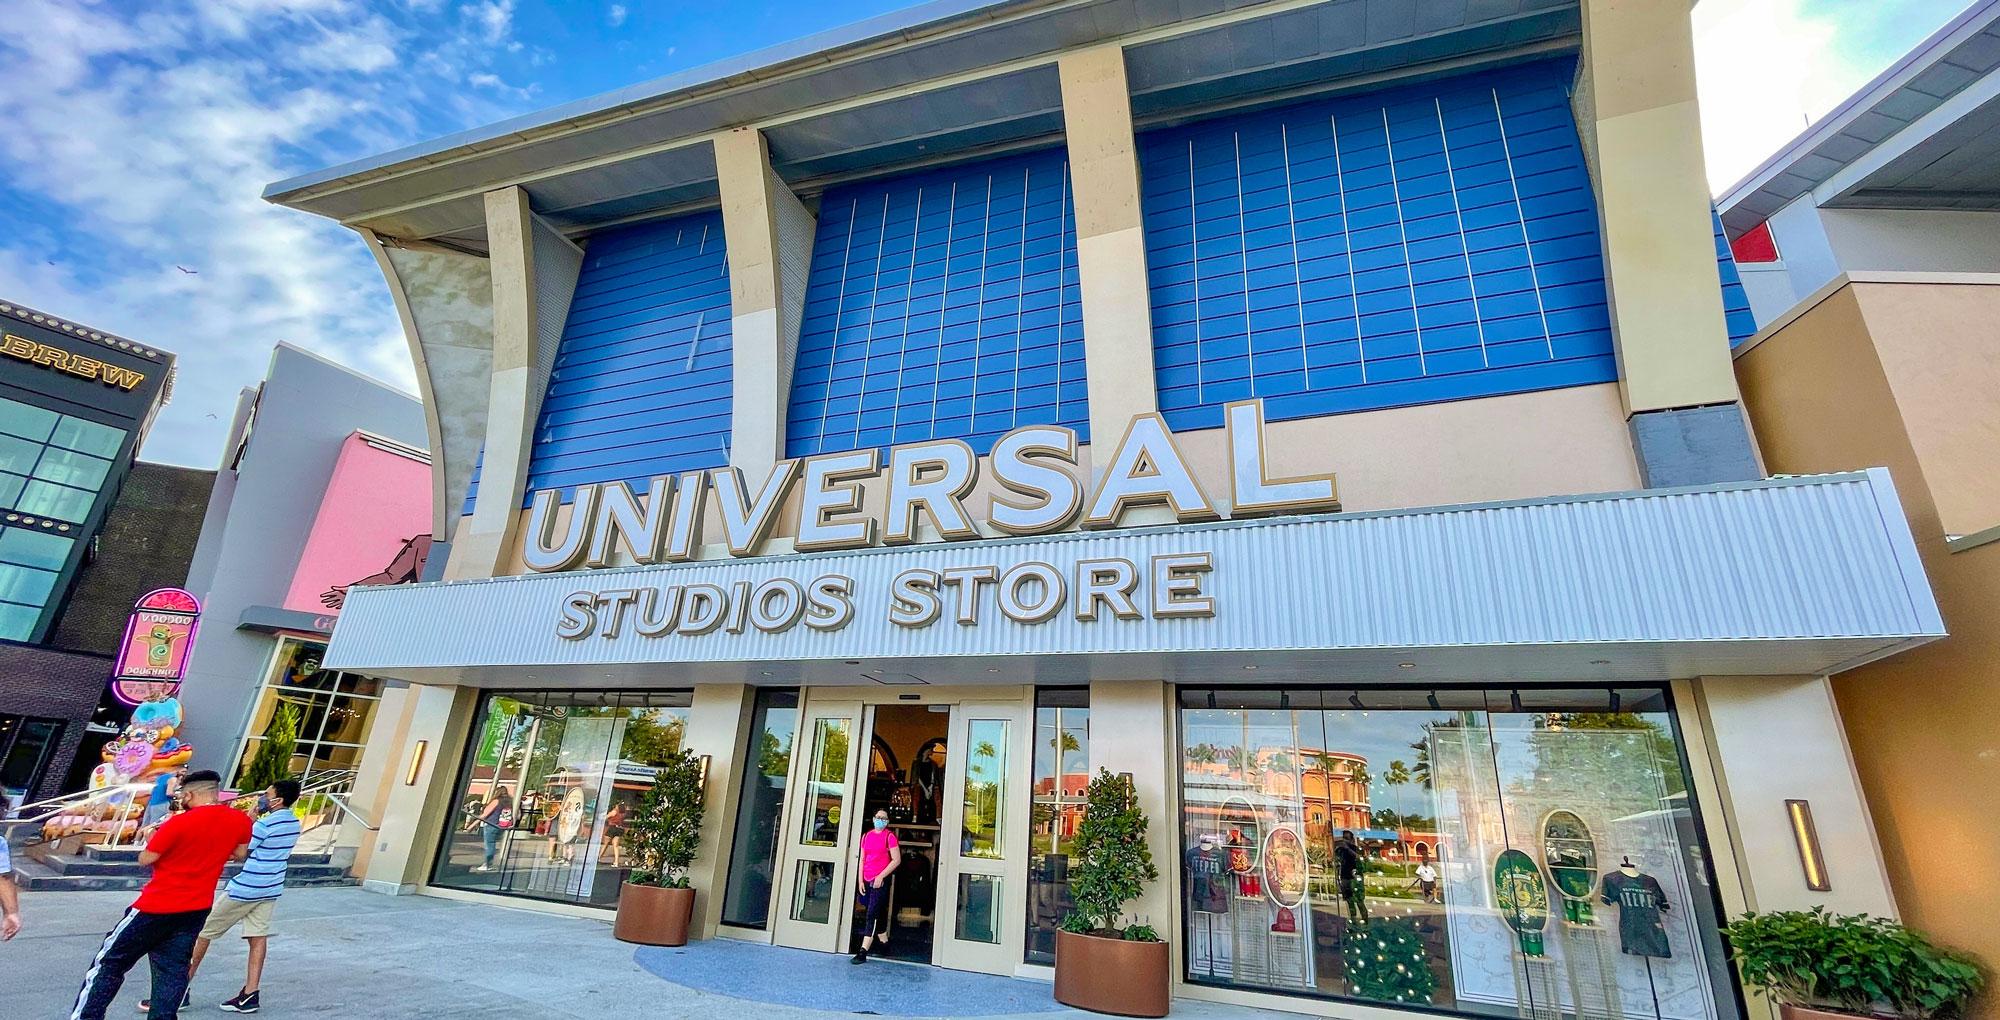 Universal Studios Store opens.